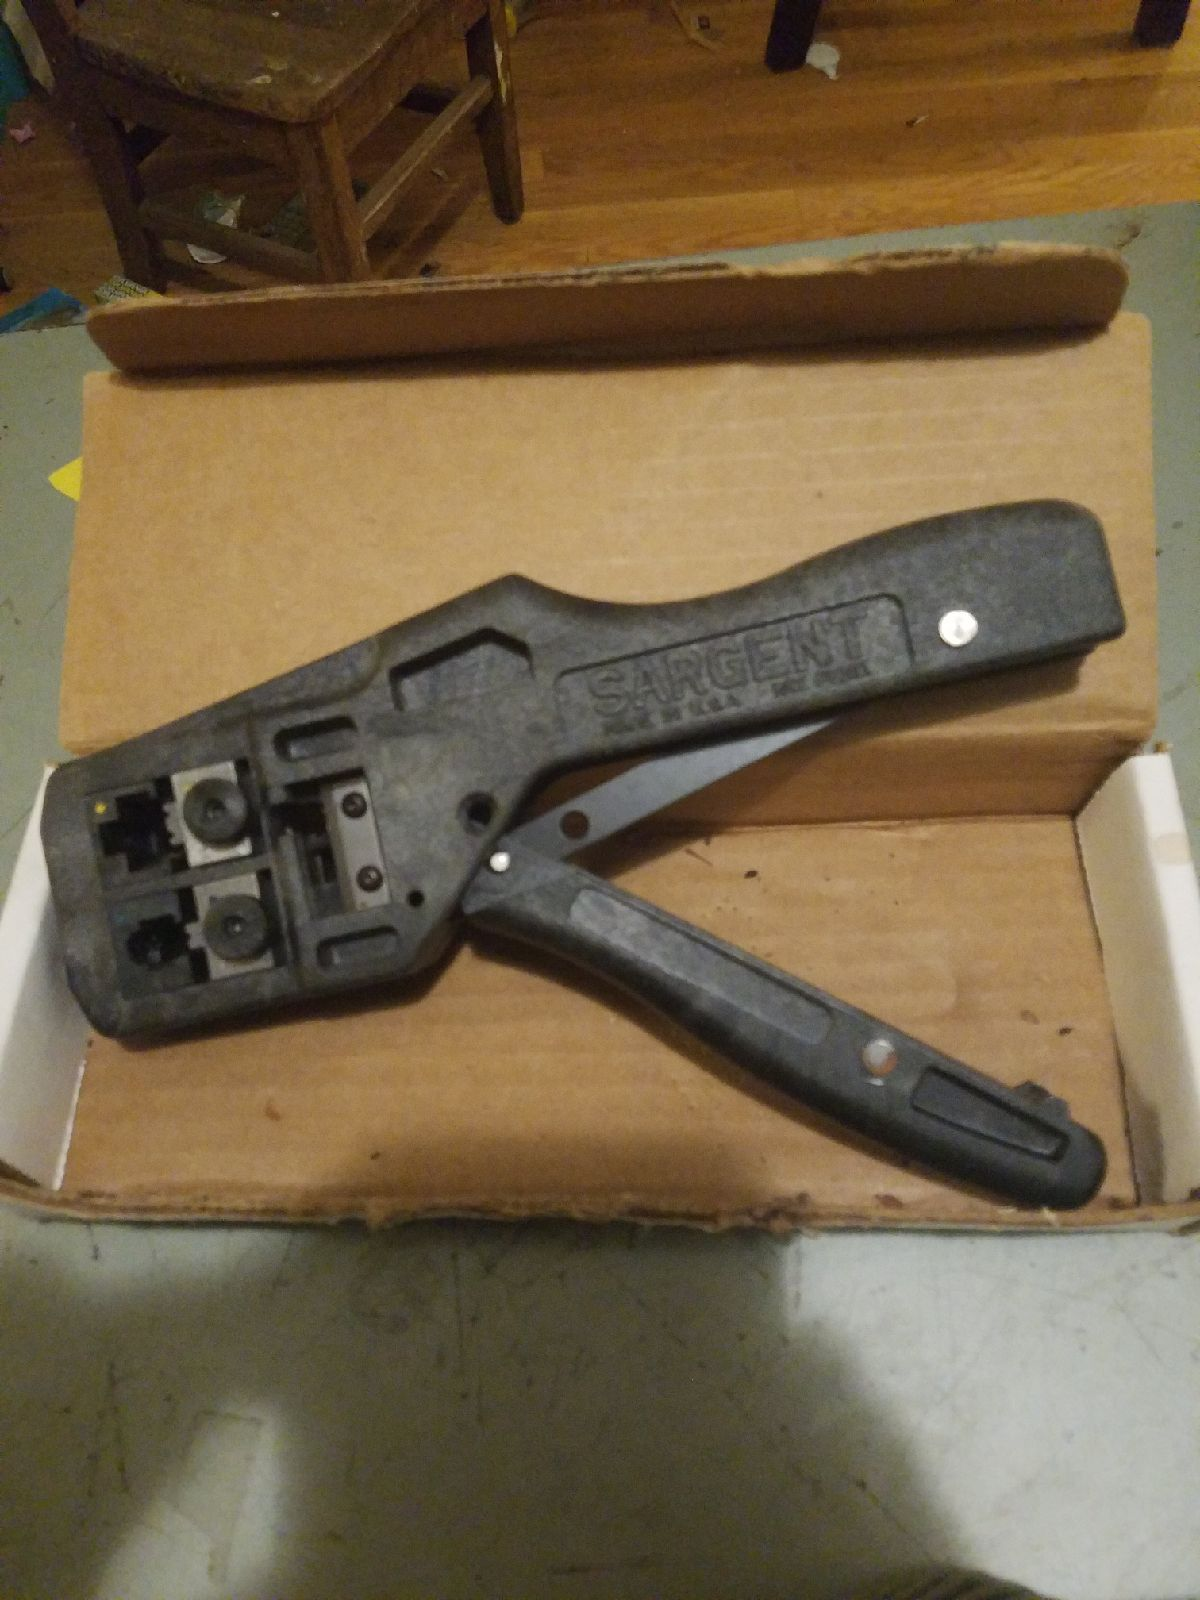 Sargent dual cavity rj11 RJ45 crimp tool